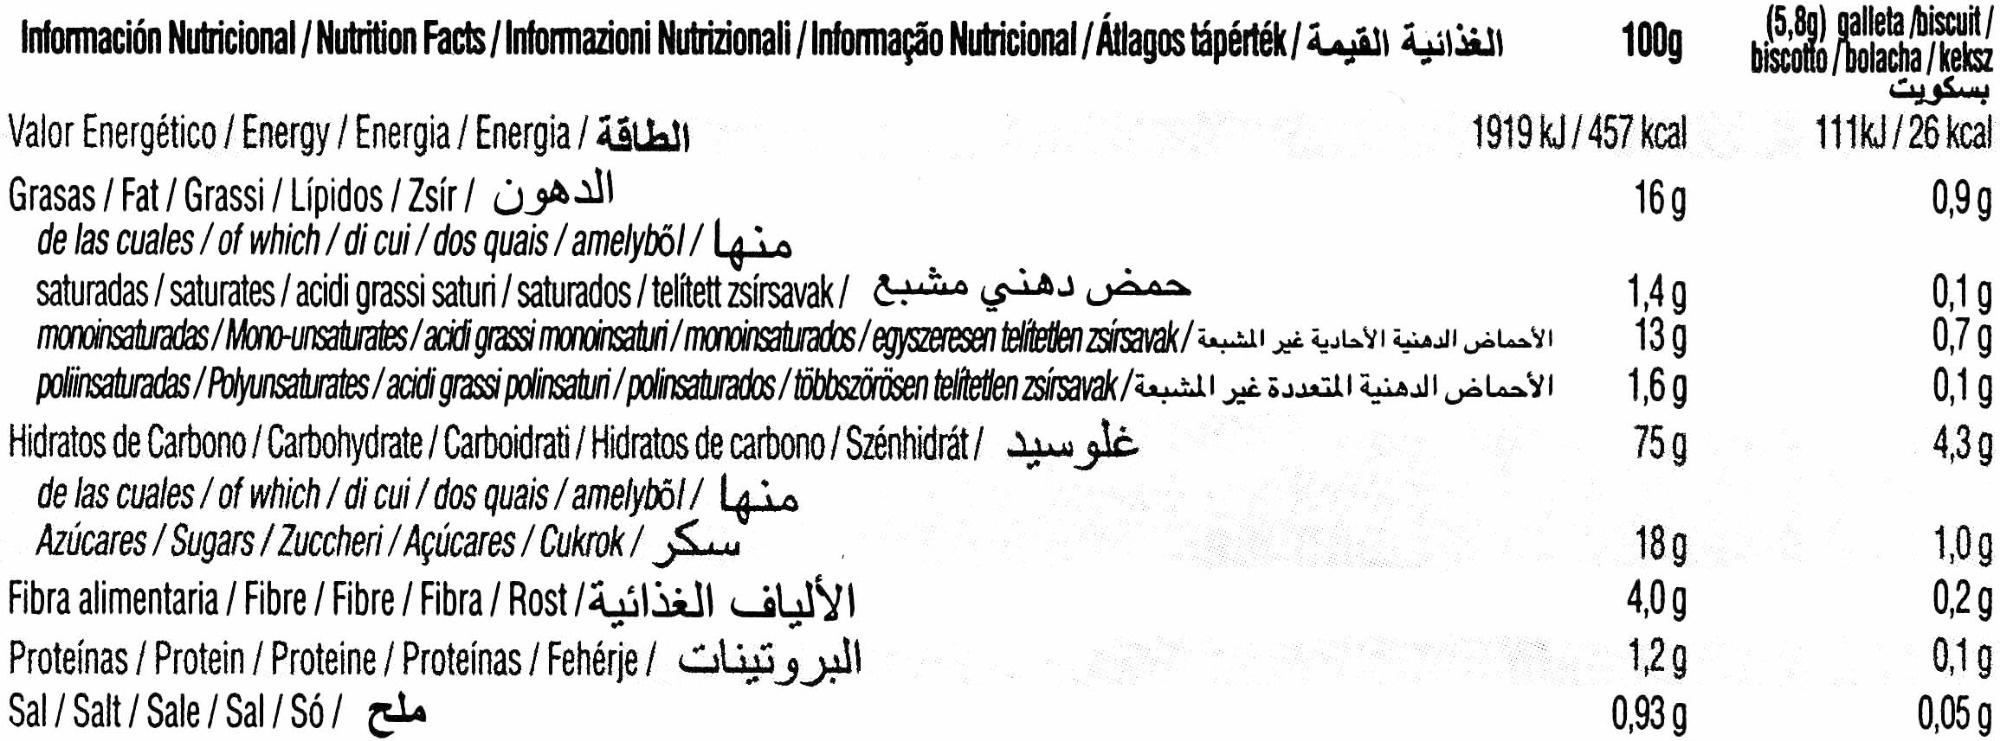 Digestive Sin Gluten - Informació nutricional